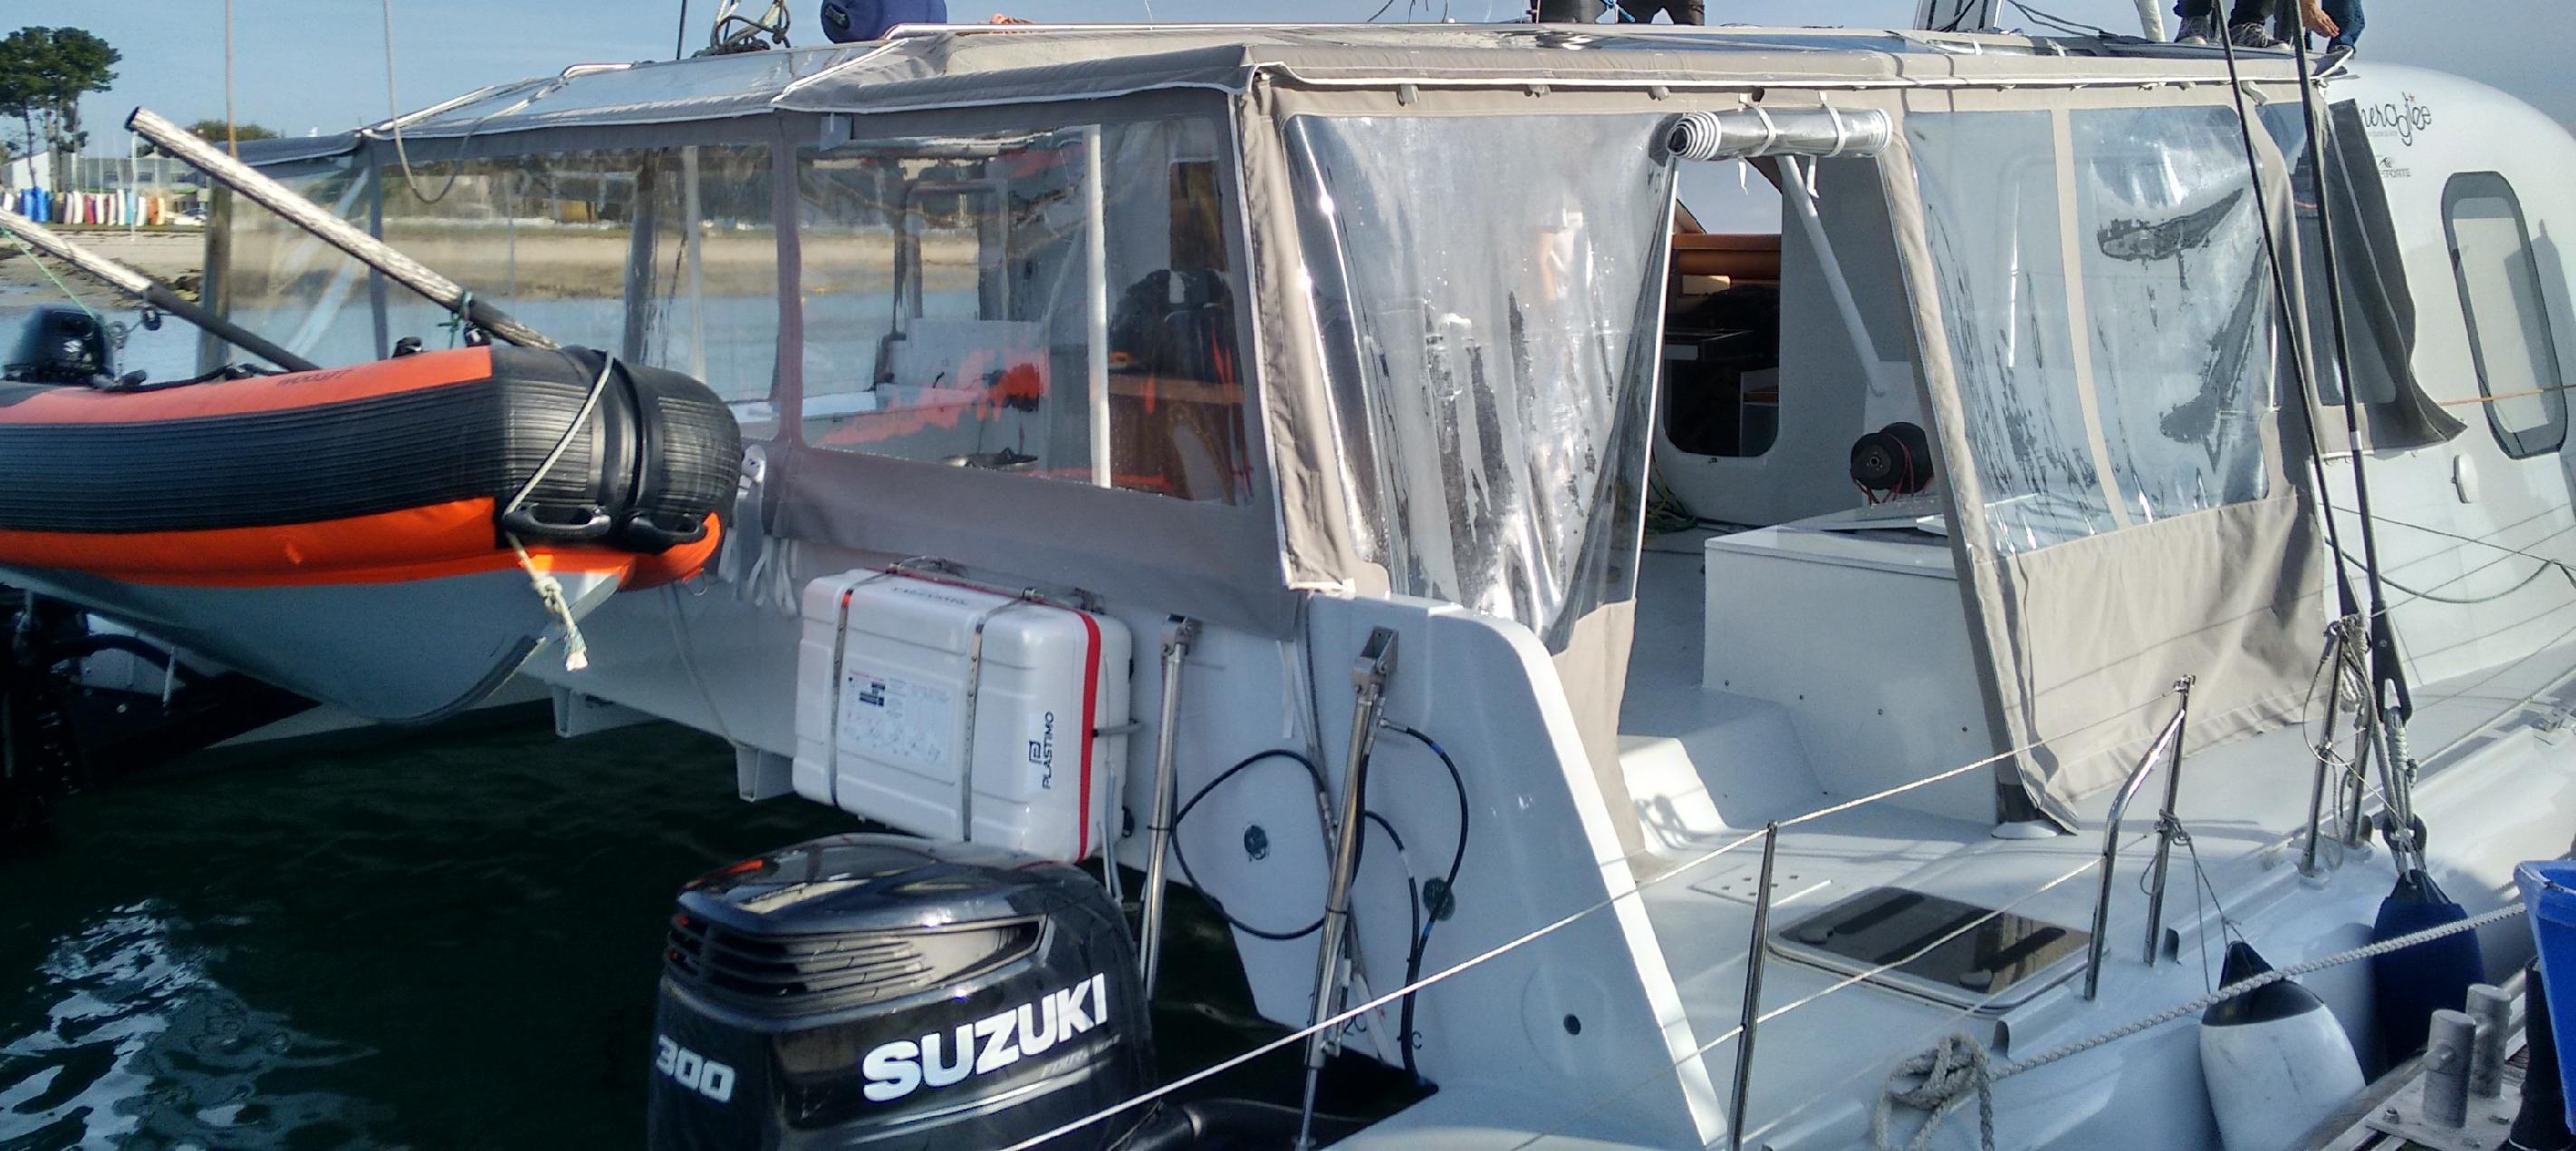 Taud de plate forme, catamaran